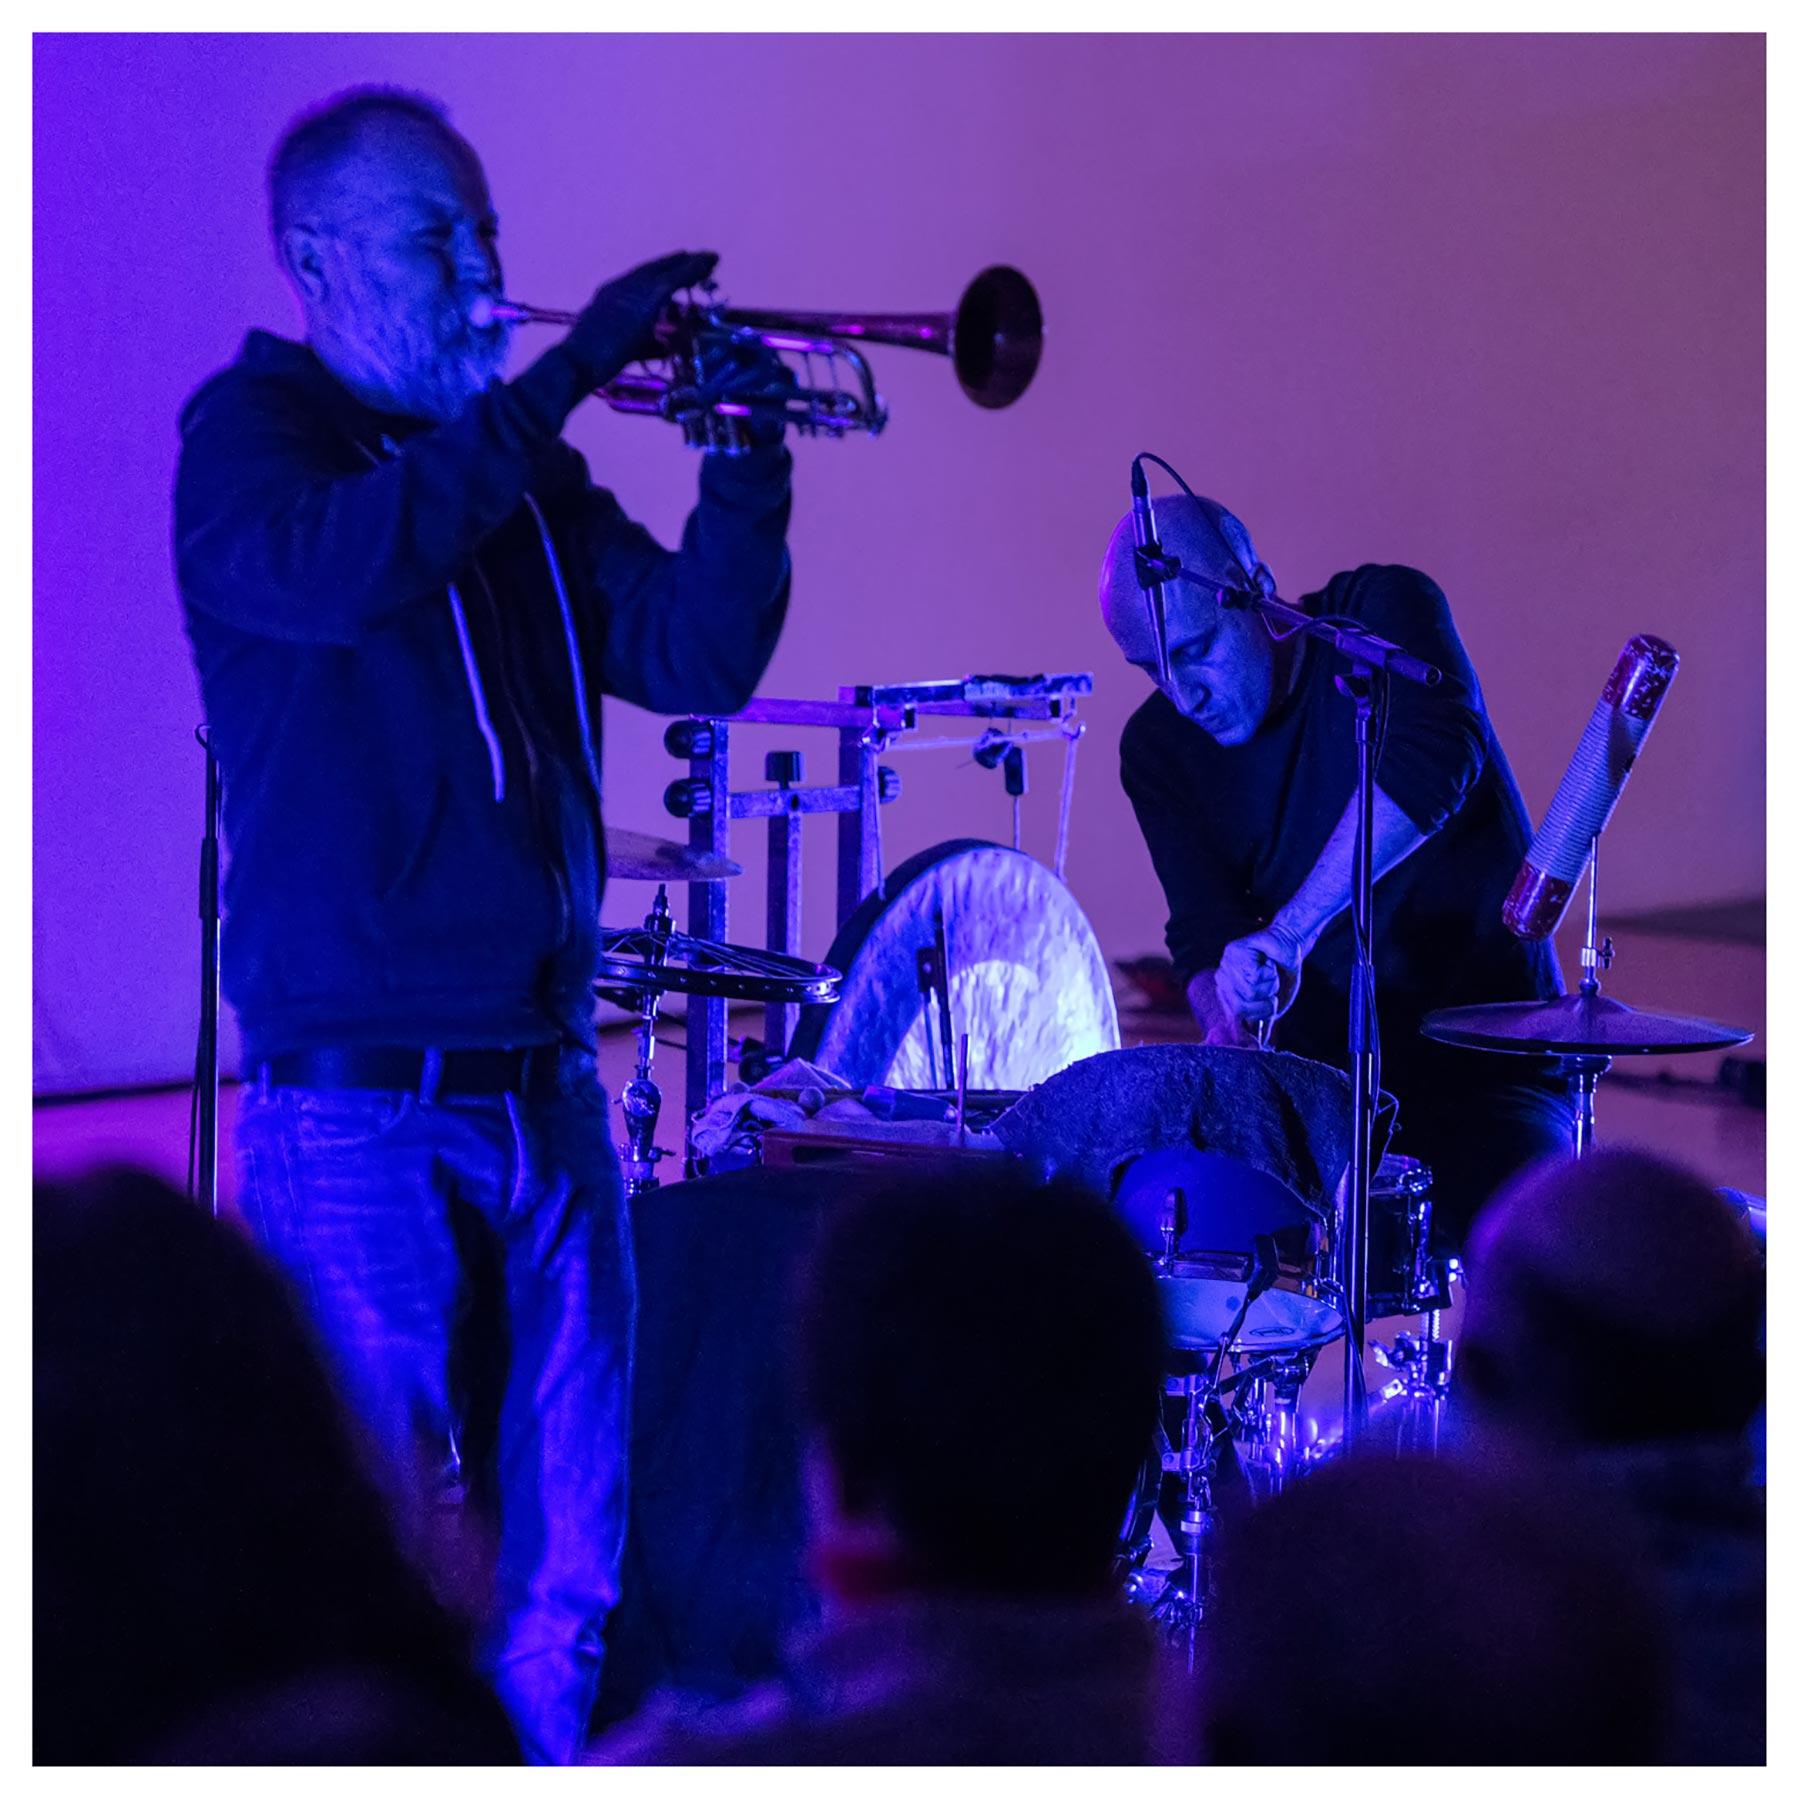 The Forgetting Machine, Jeff Kaiser and Luis Tabuenca at the Bernaola Music Festival, Artium, Vitoria-Gasteiz, Spain